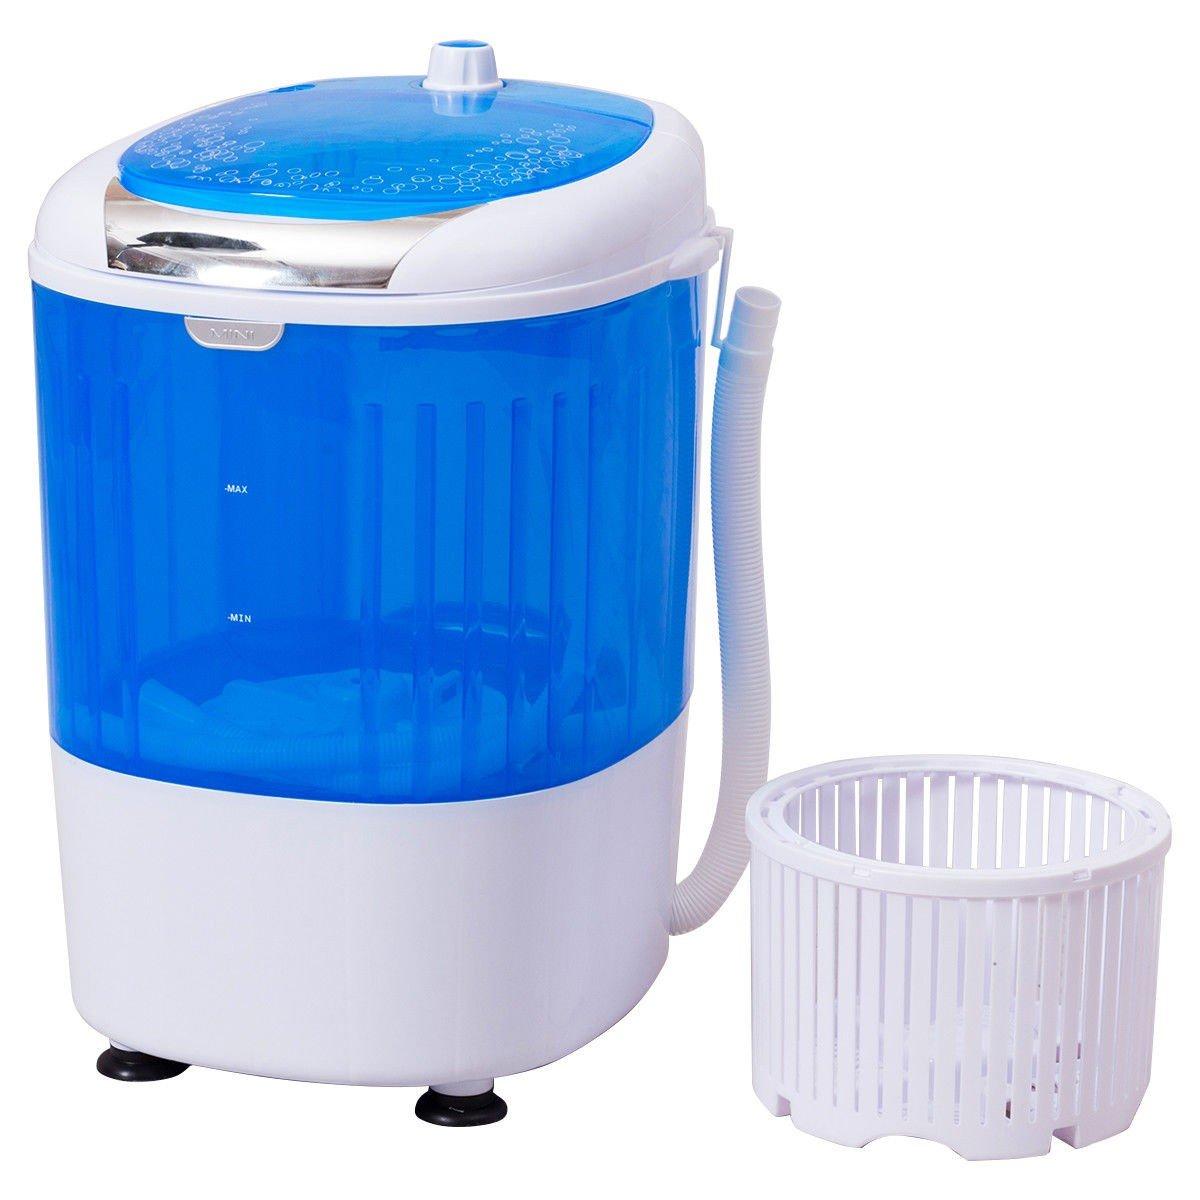 Washing Machine, 5.5 lbs Portable Mini Semi Auto Washing Machine by MD Group (Image #1)